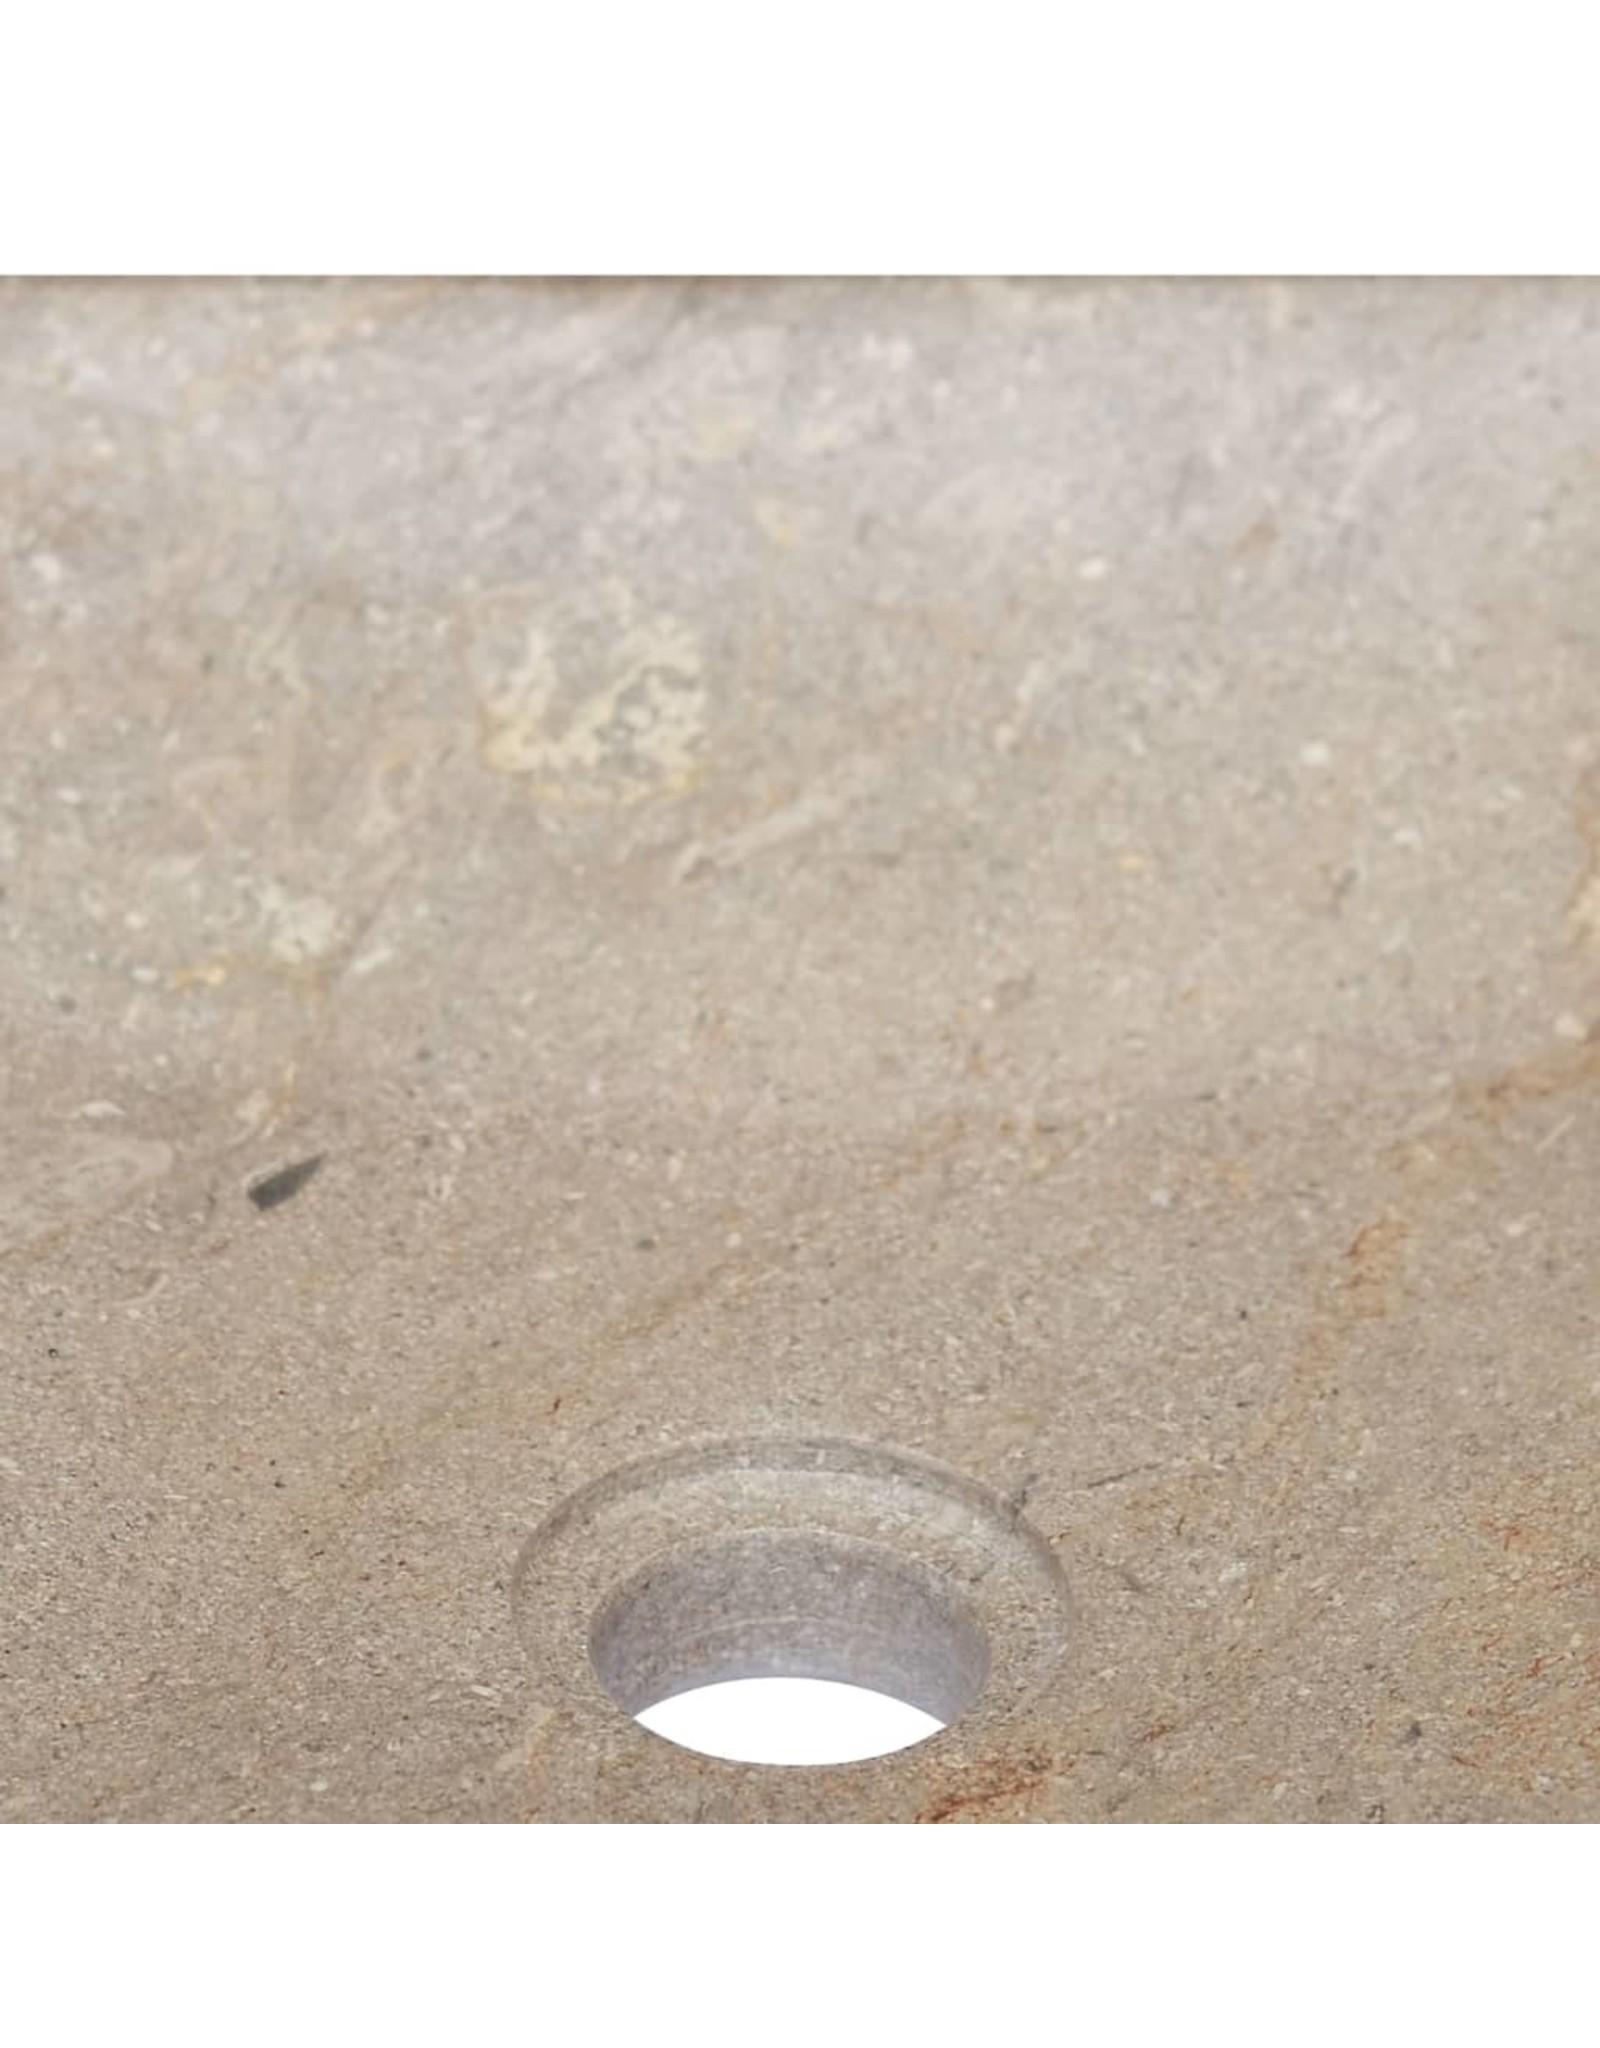 Gootsteen 40x40x10 cm marmer grijs